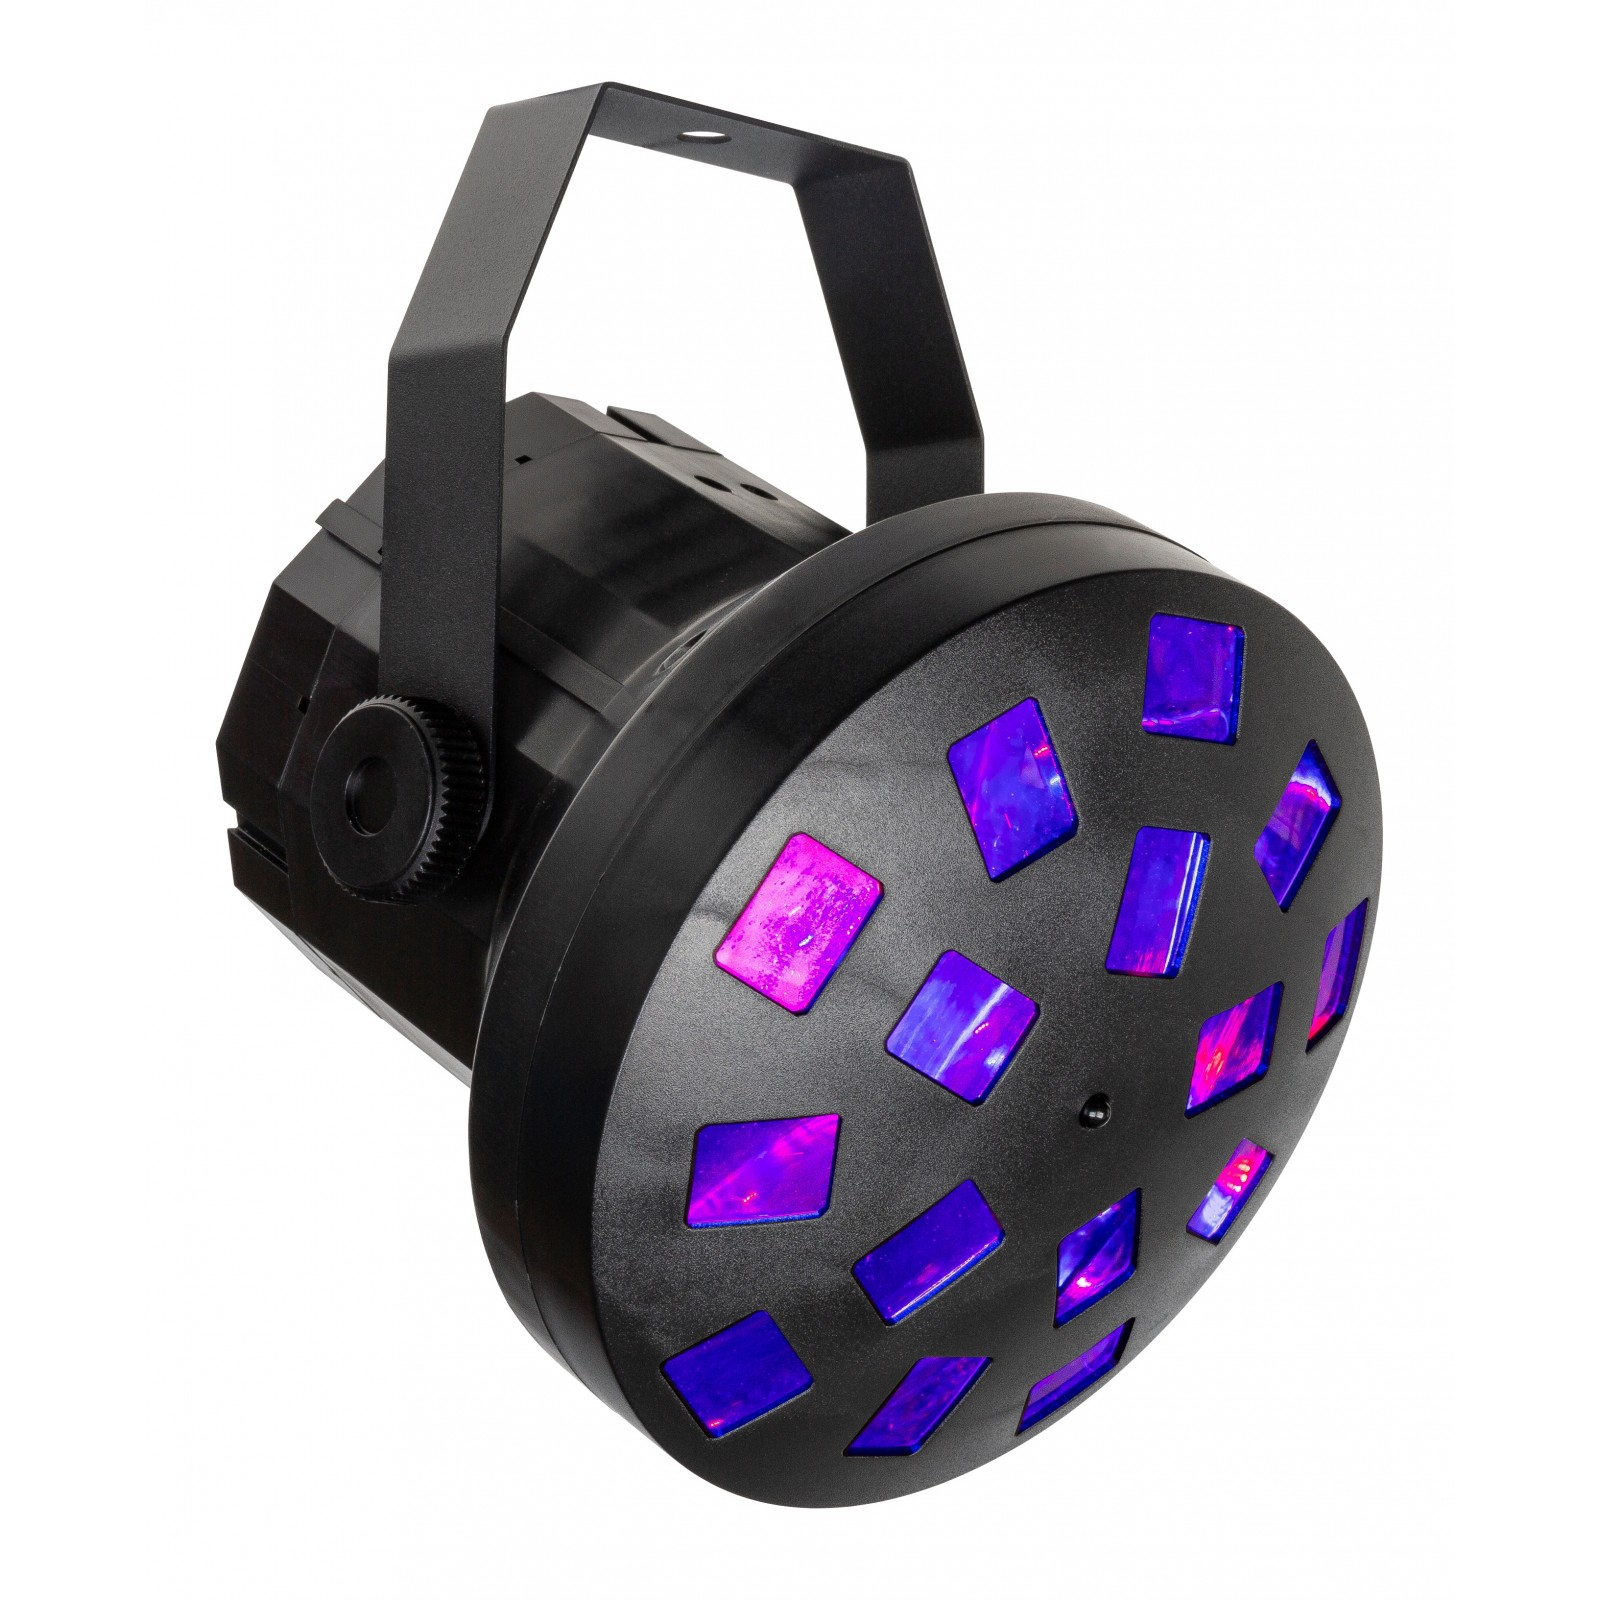 USB MUSHROOM, 5V USB RGBW light mushroom effect